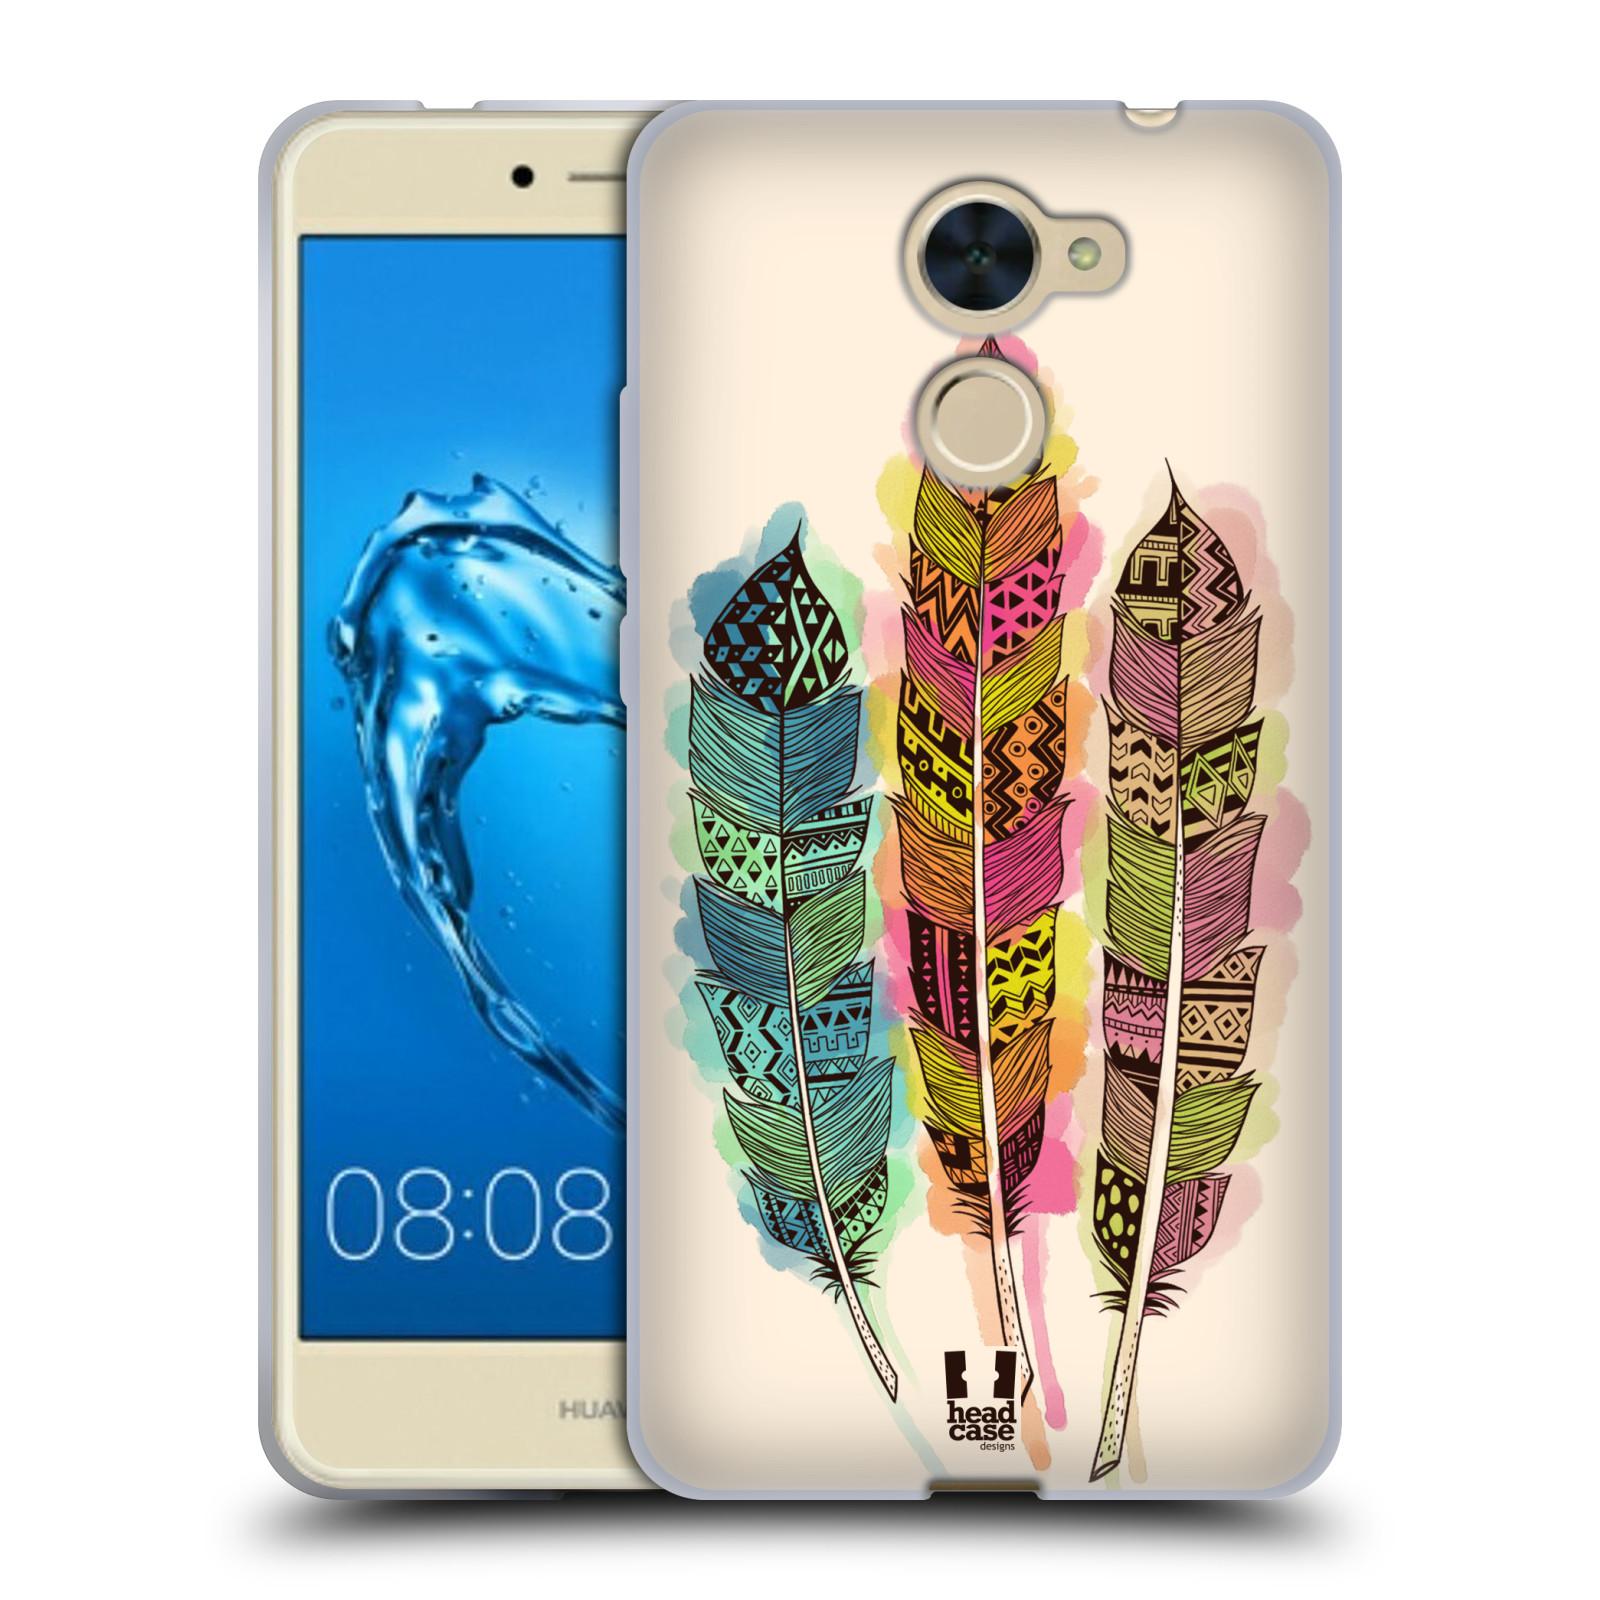 Silikonové pouzdro na mobil Huawei Y7 - Head Case - AZTEC PÍRKA SPLASH